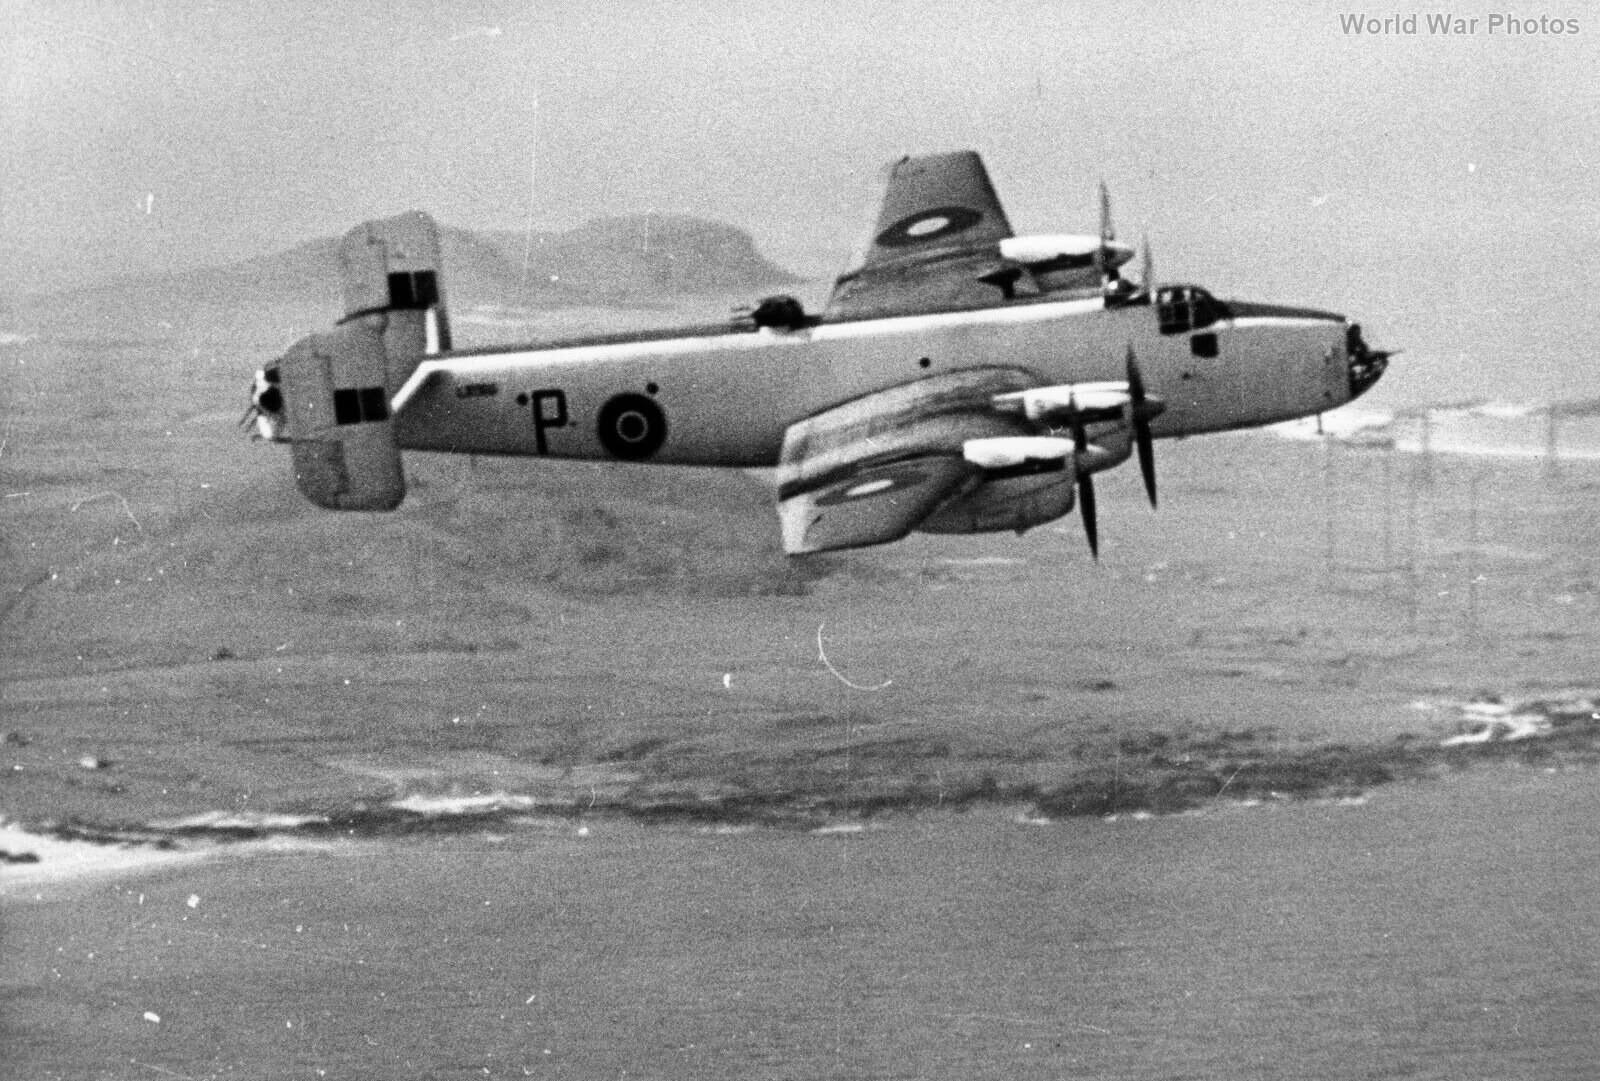 Halifax V LK966 518 Sqn over Tiree